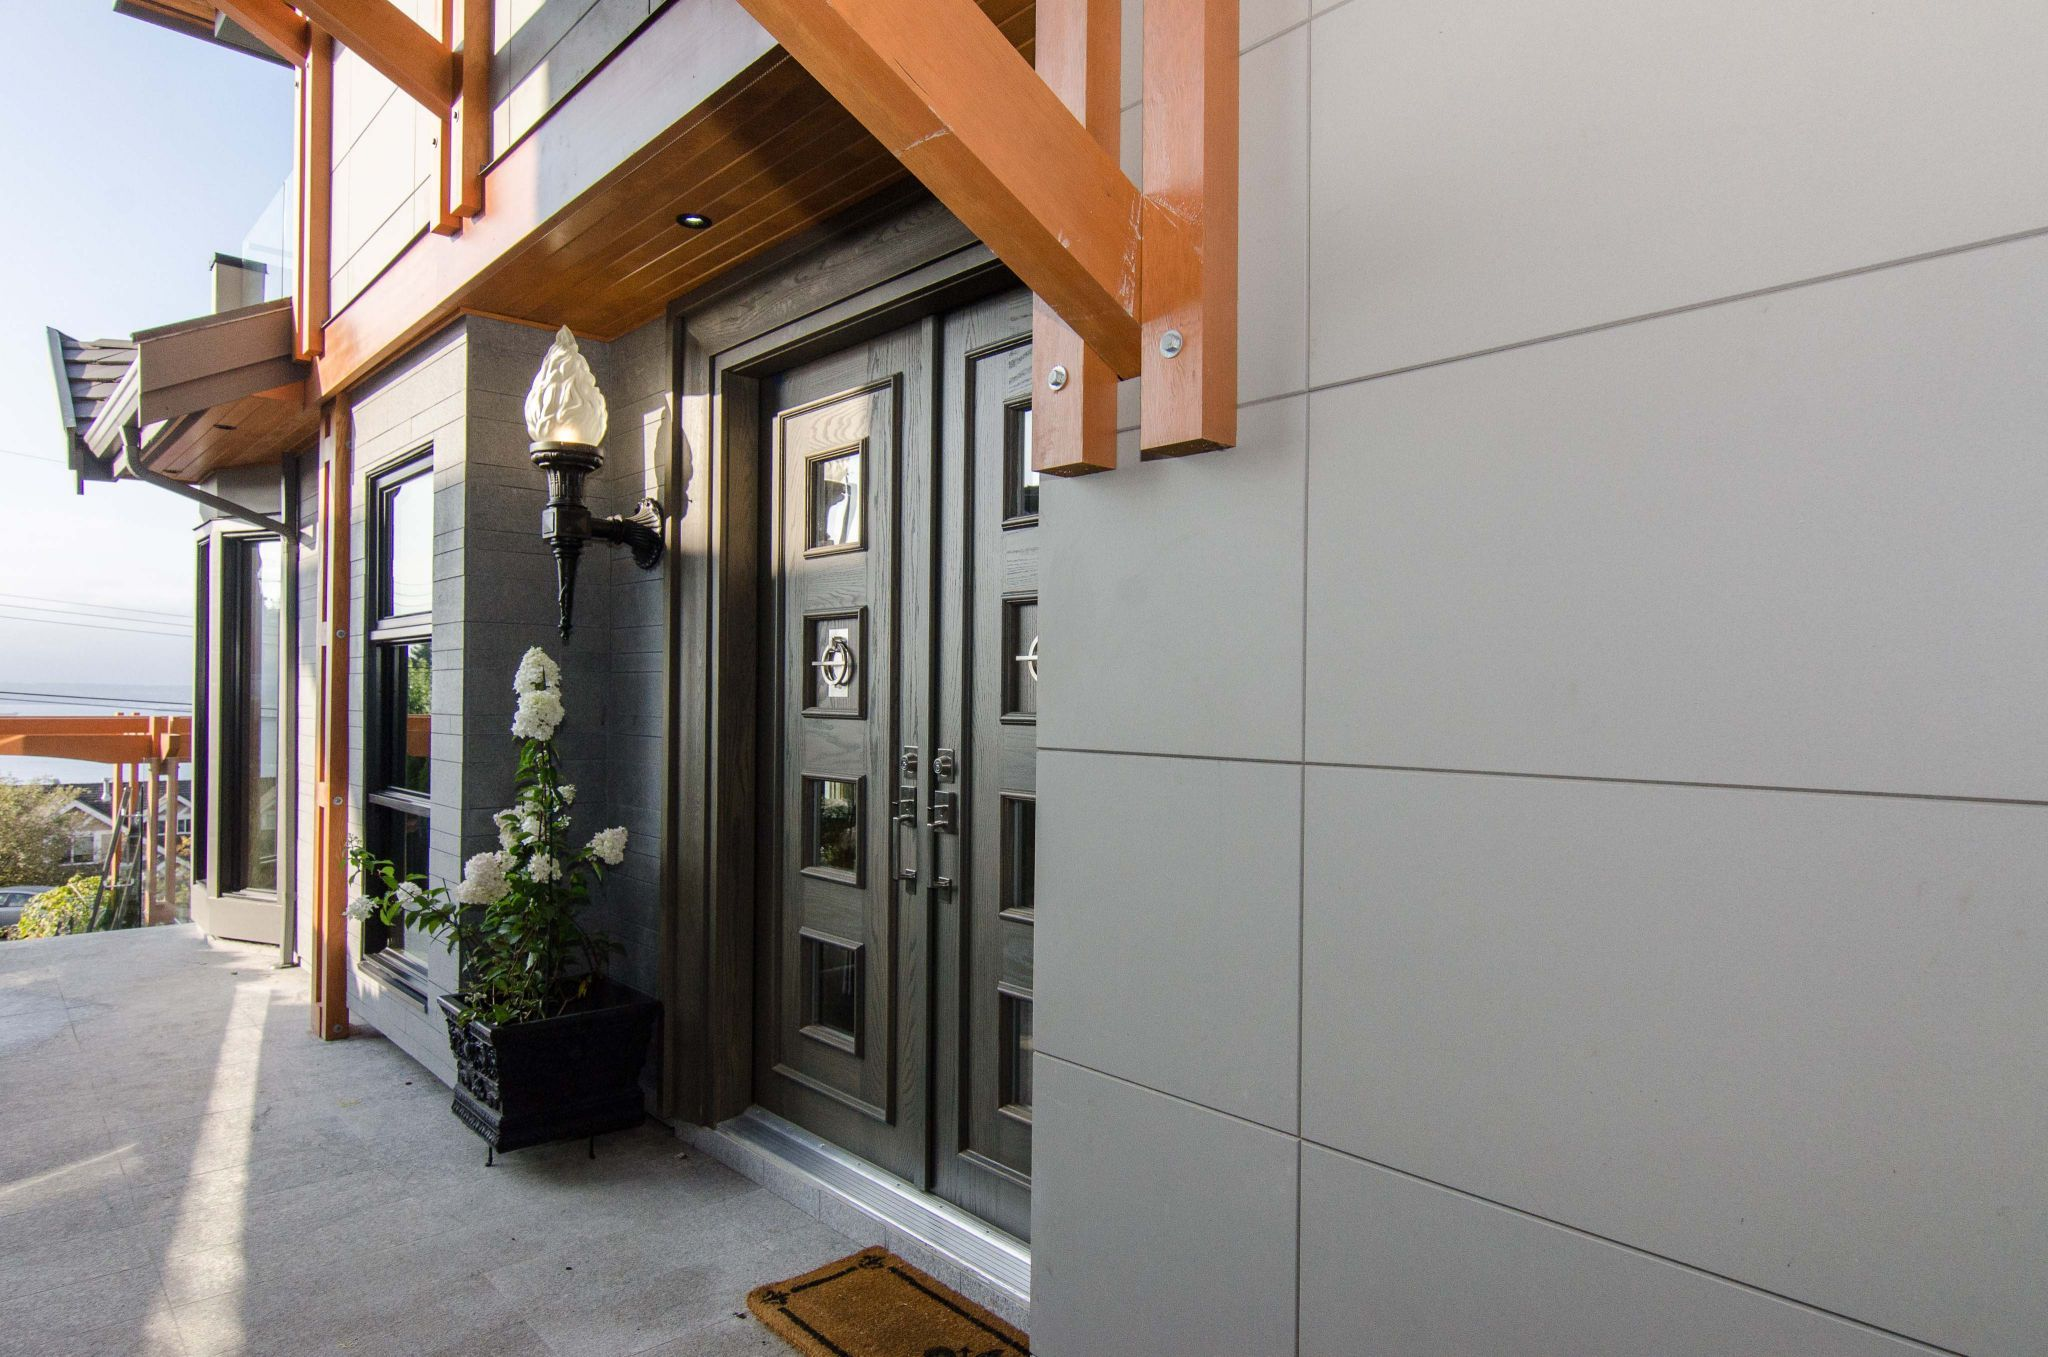 Image Result For Fiber Cement Siding Slab Fibre Cement Cladding Fiber Cement Siding Modern House Exterior